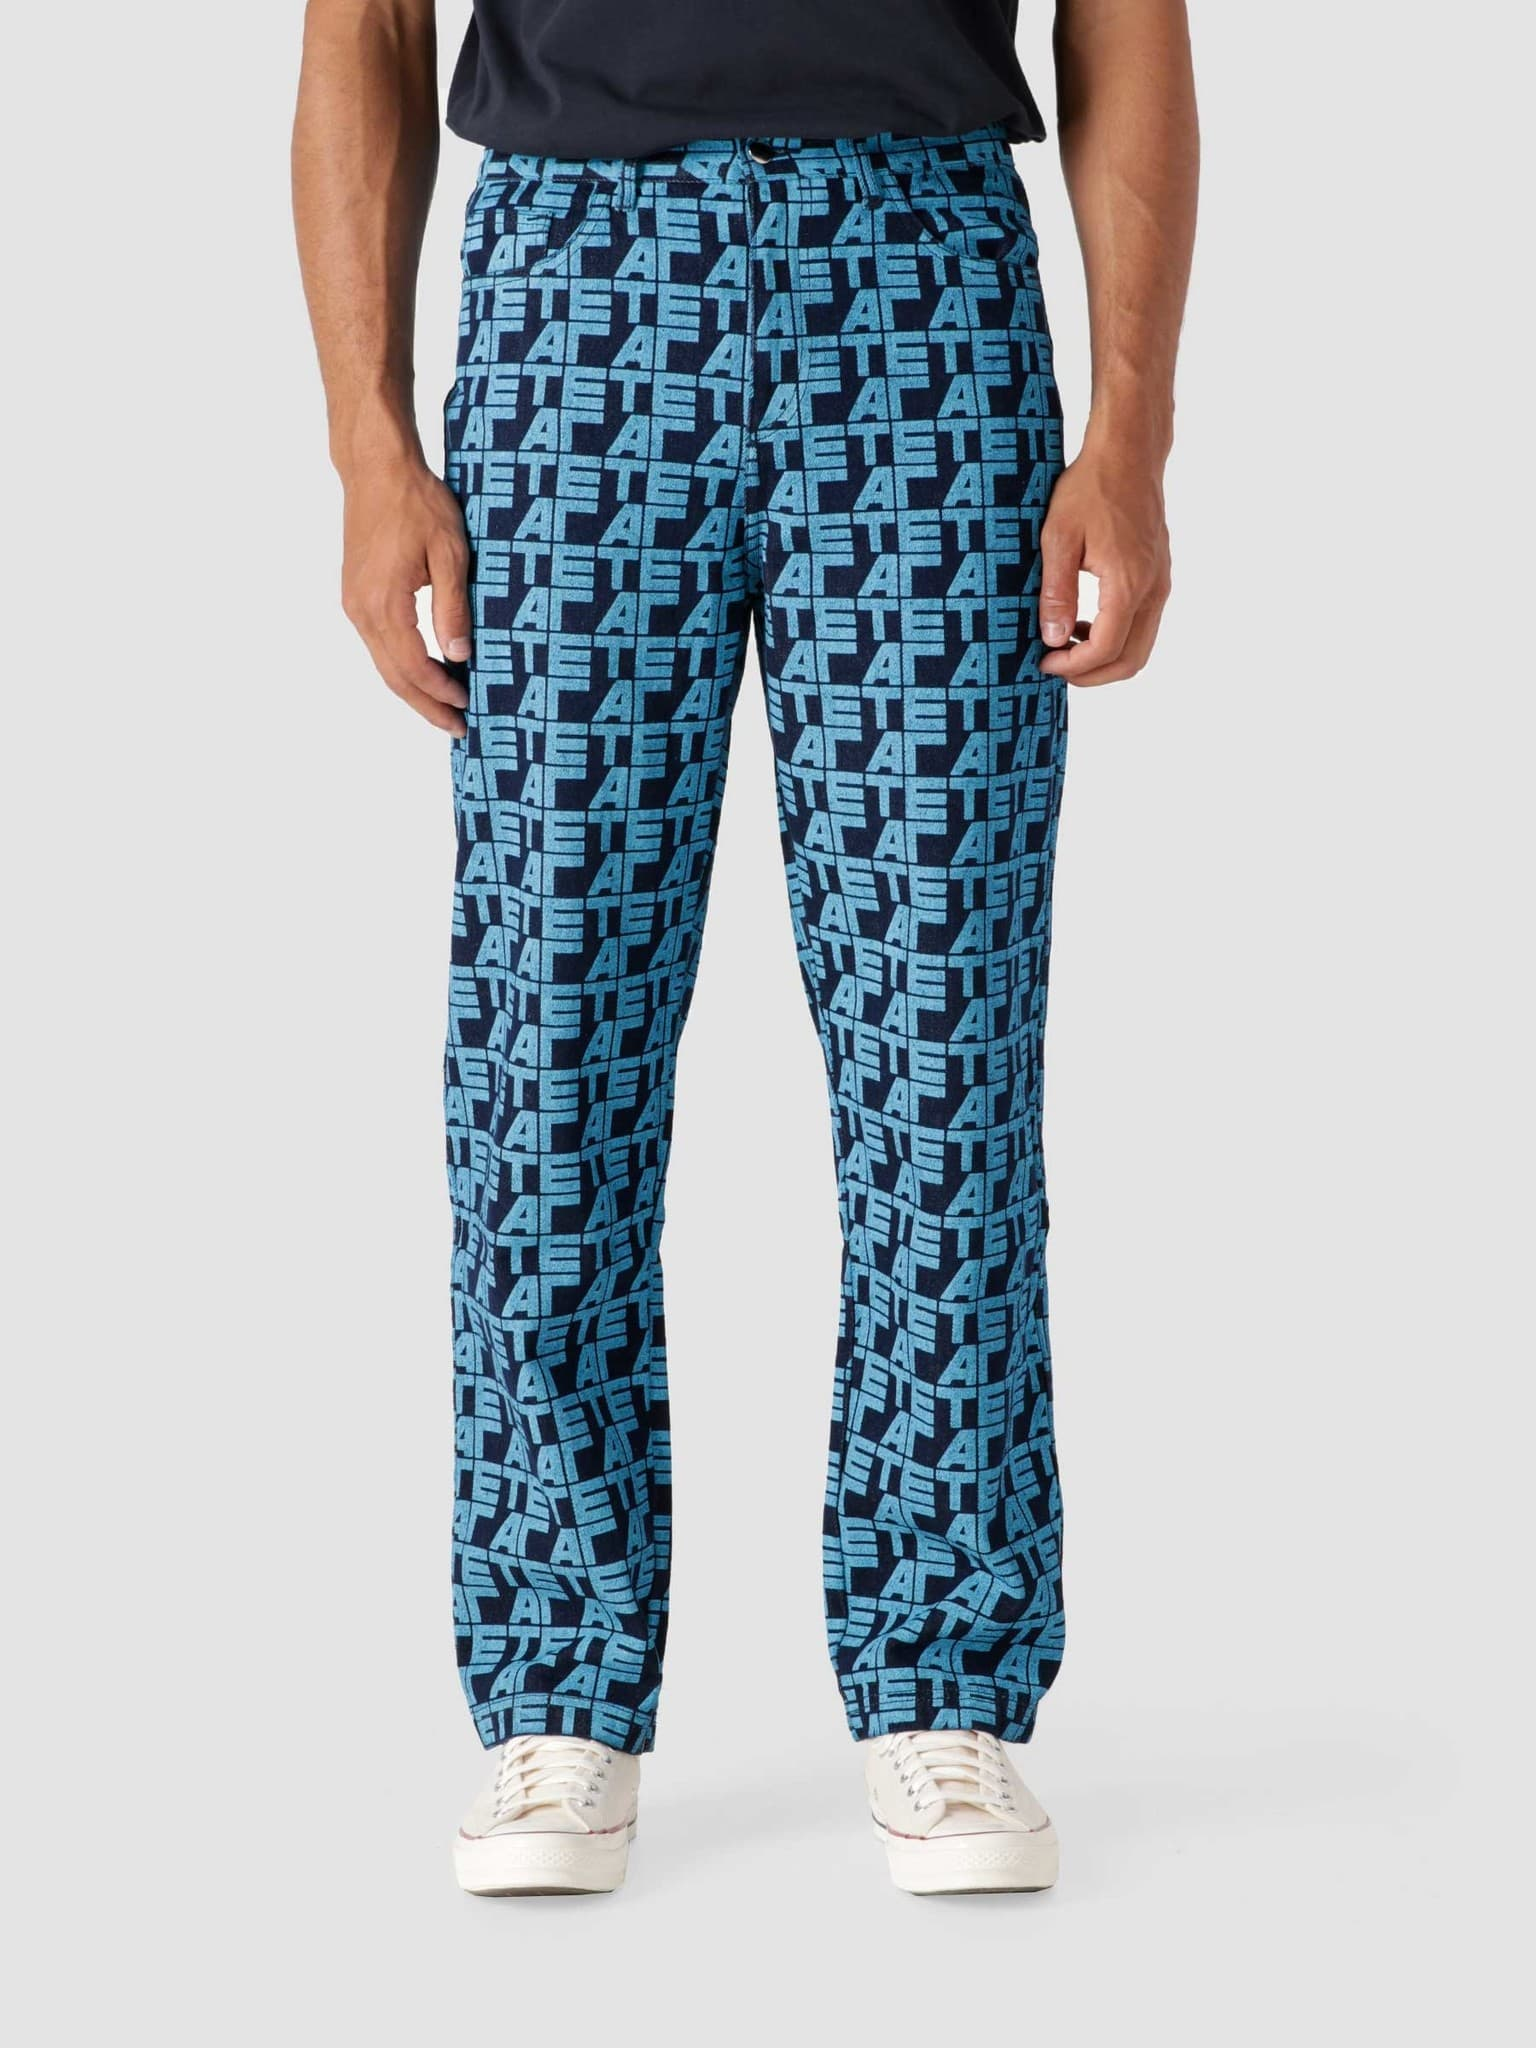 Jean Allover Pants Pants Denim Printed AW21-037P